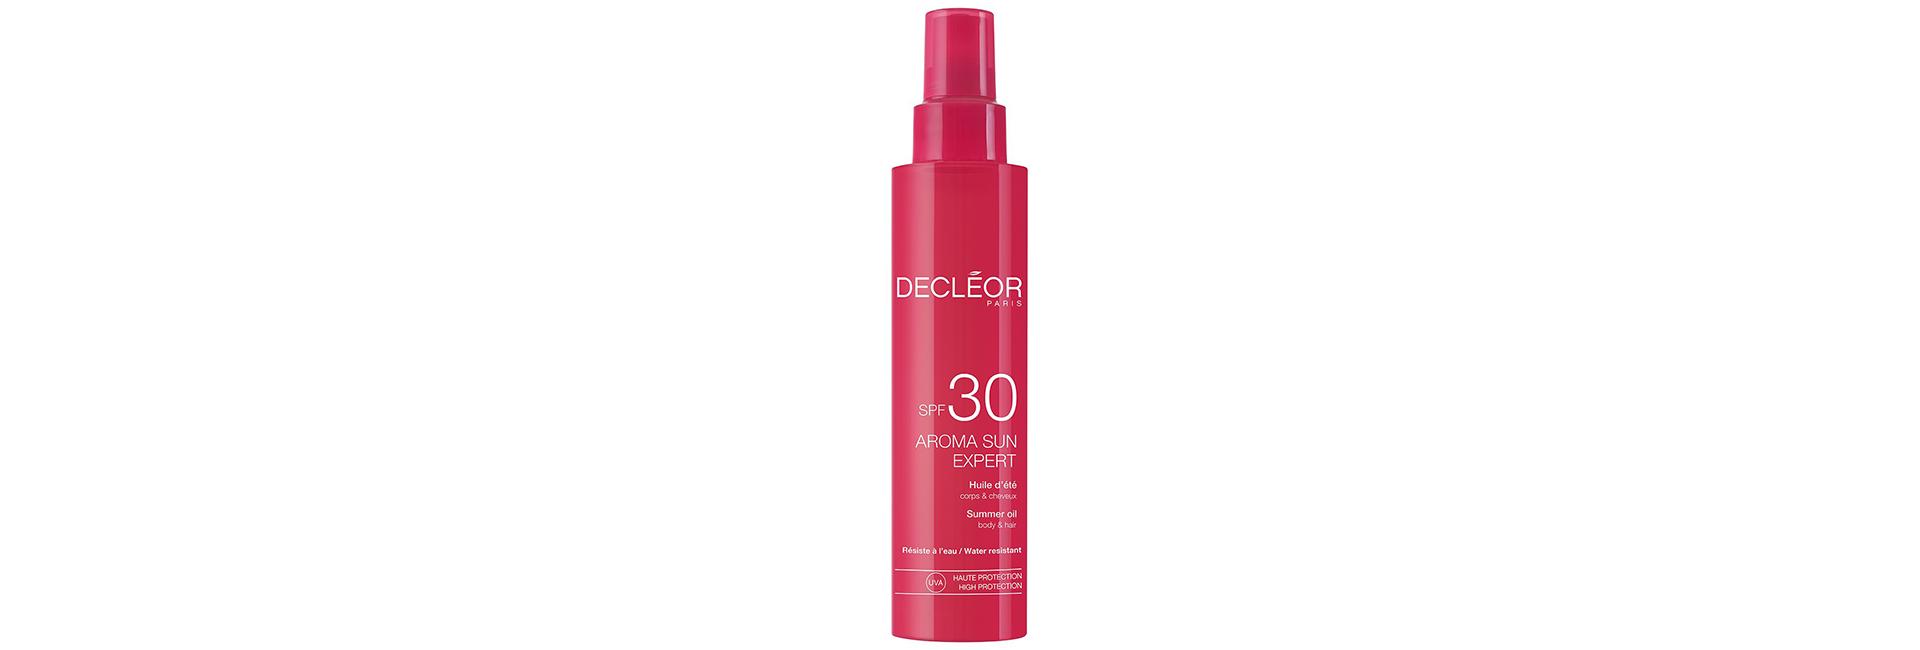 huile-d-ete-aroma-sun-expert-spf30-decleor-blog-beaute-soin-parfum-homme